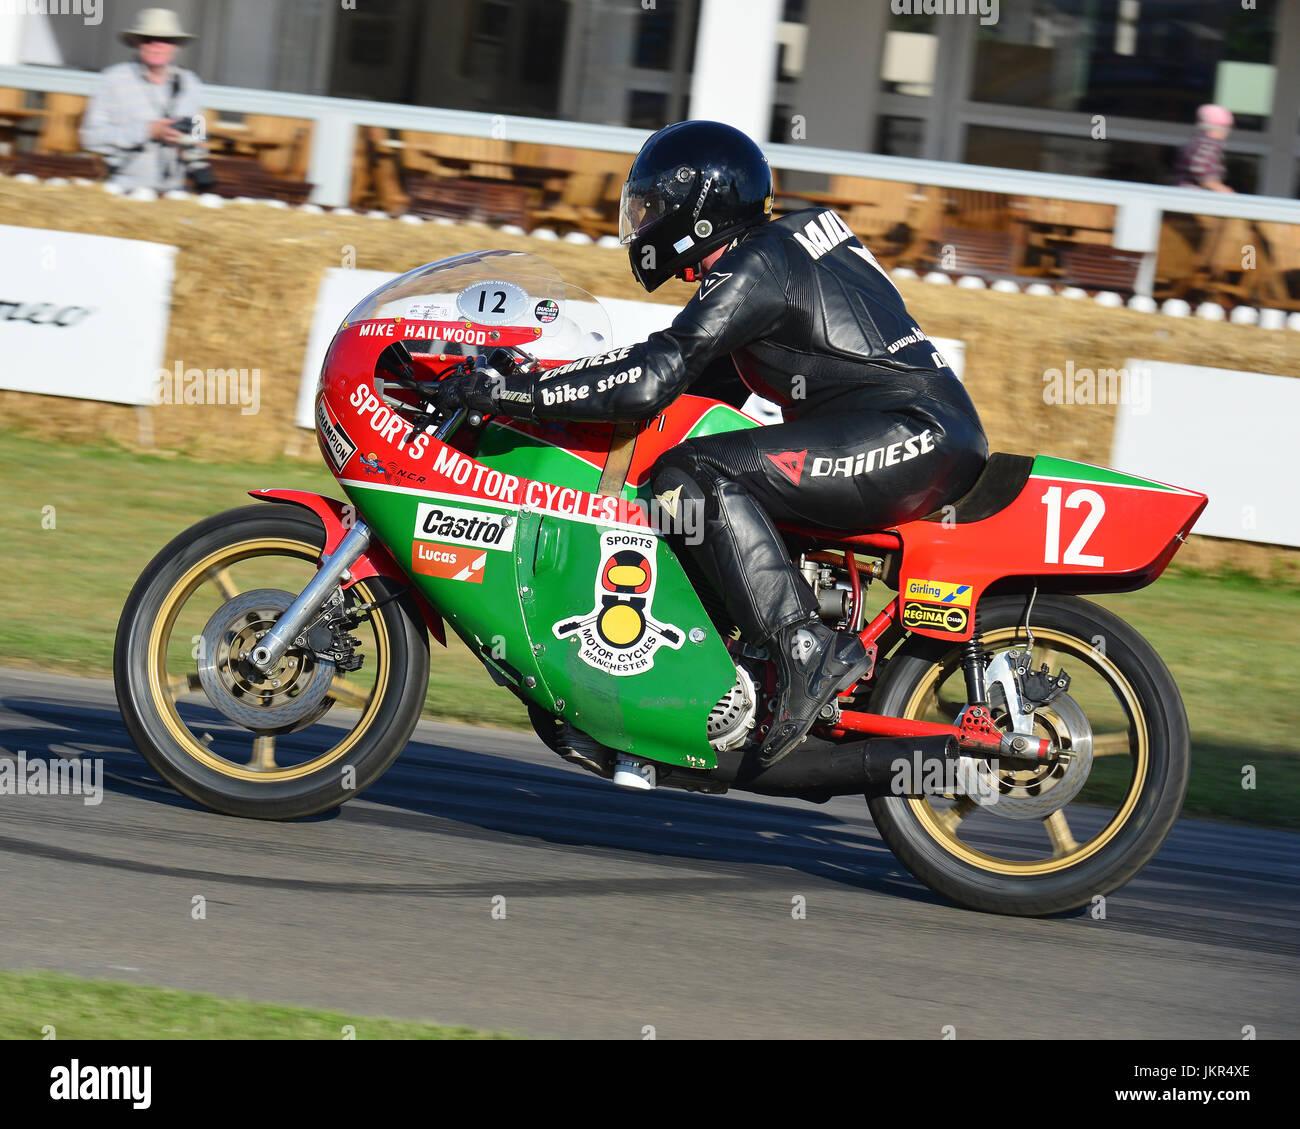 David Hailwood Ducati 900SS TT Goodwood Festival Of Speed 2017 Peaks Performance Motorsports Game Changers Automobiles Cars Entertainment